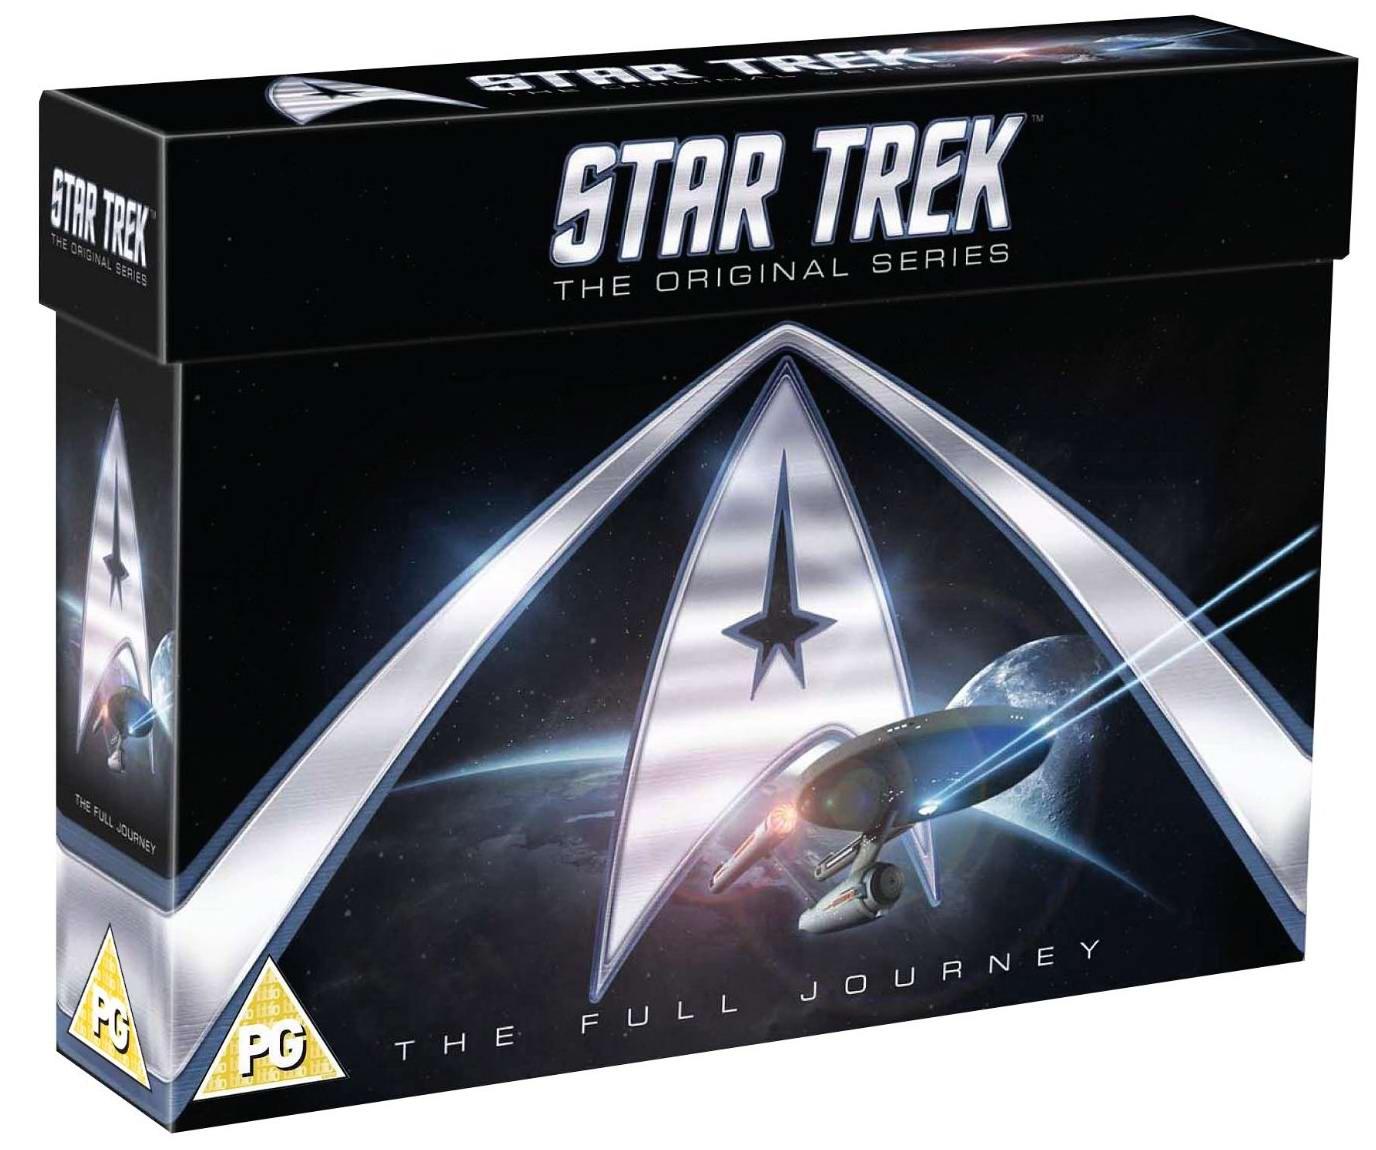 star trek the original series the full journey dvd. Black Bedroom Furniture Sets. Home Design Ideas